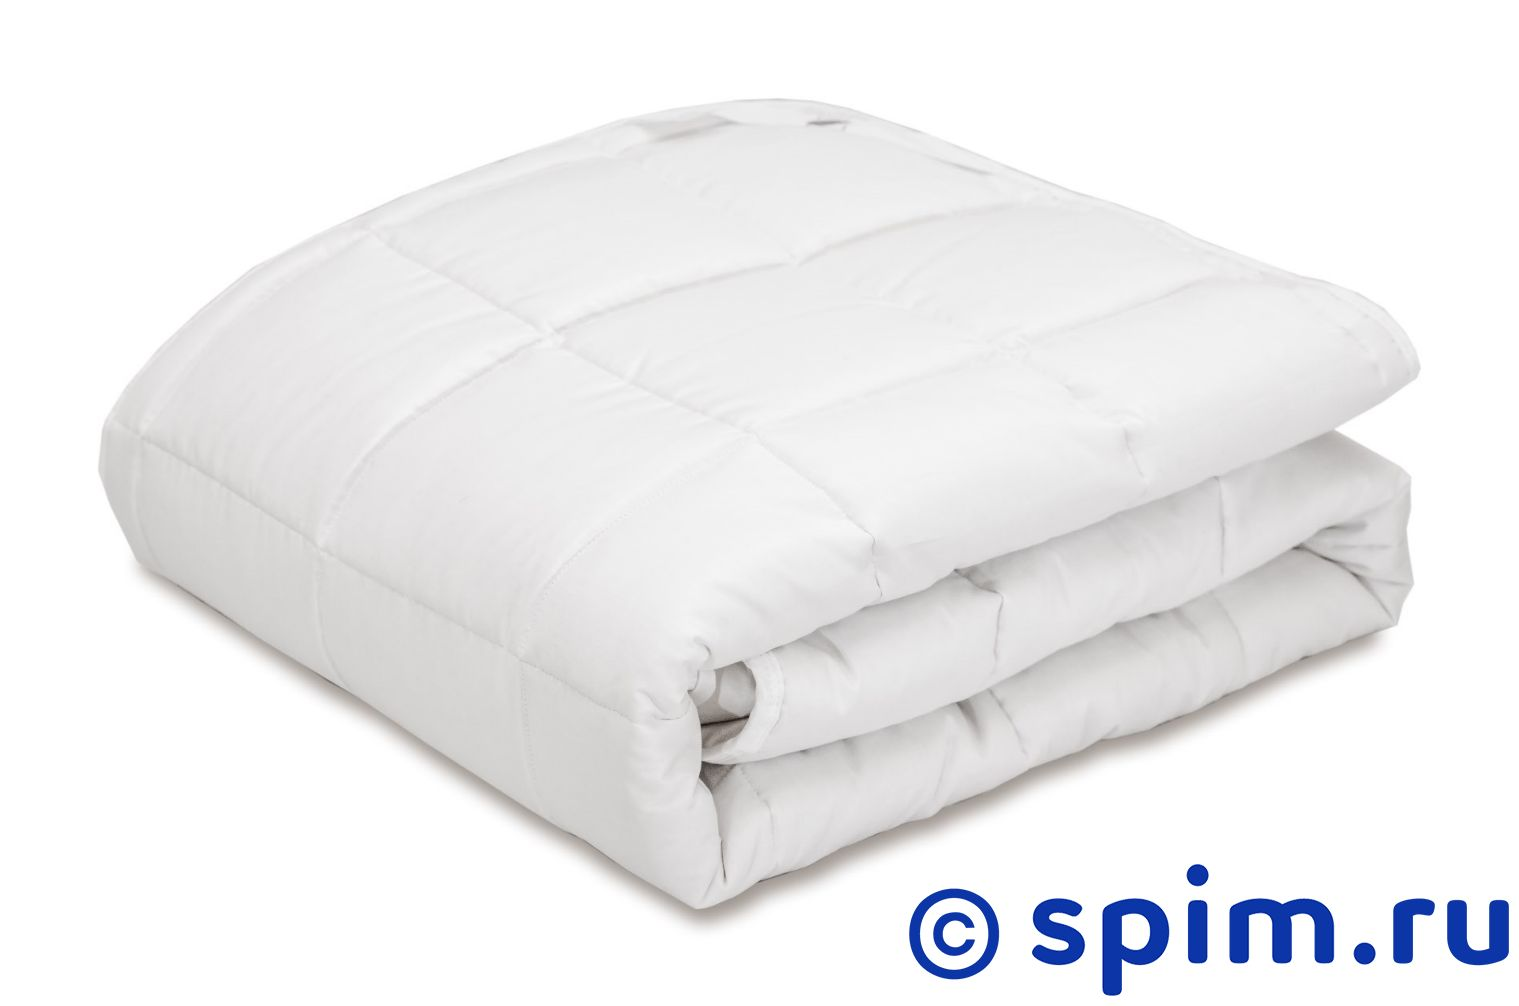 Одеяло шерстяное Констант Традиция 150x200